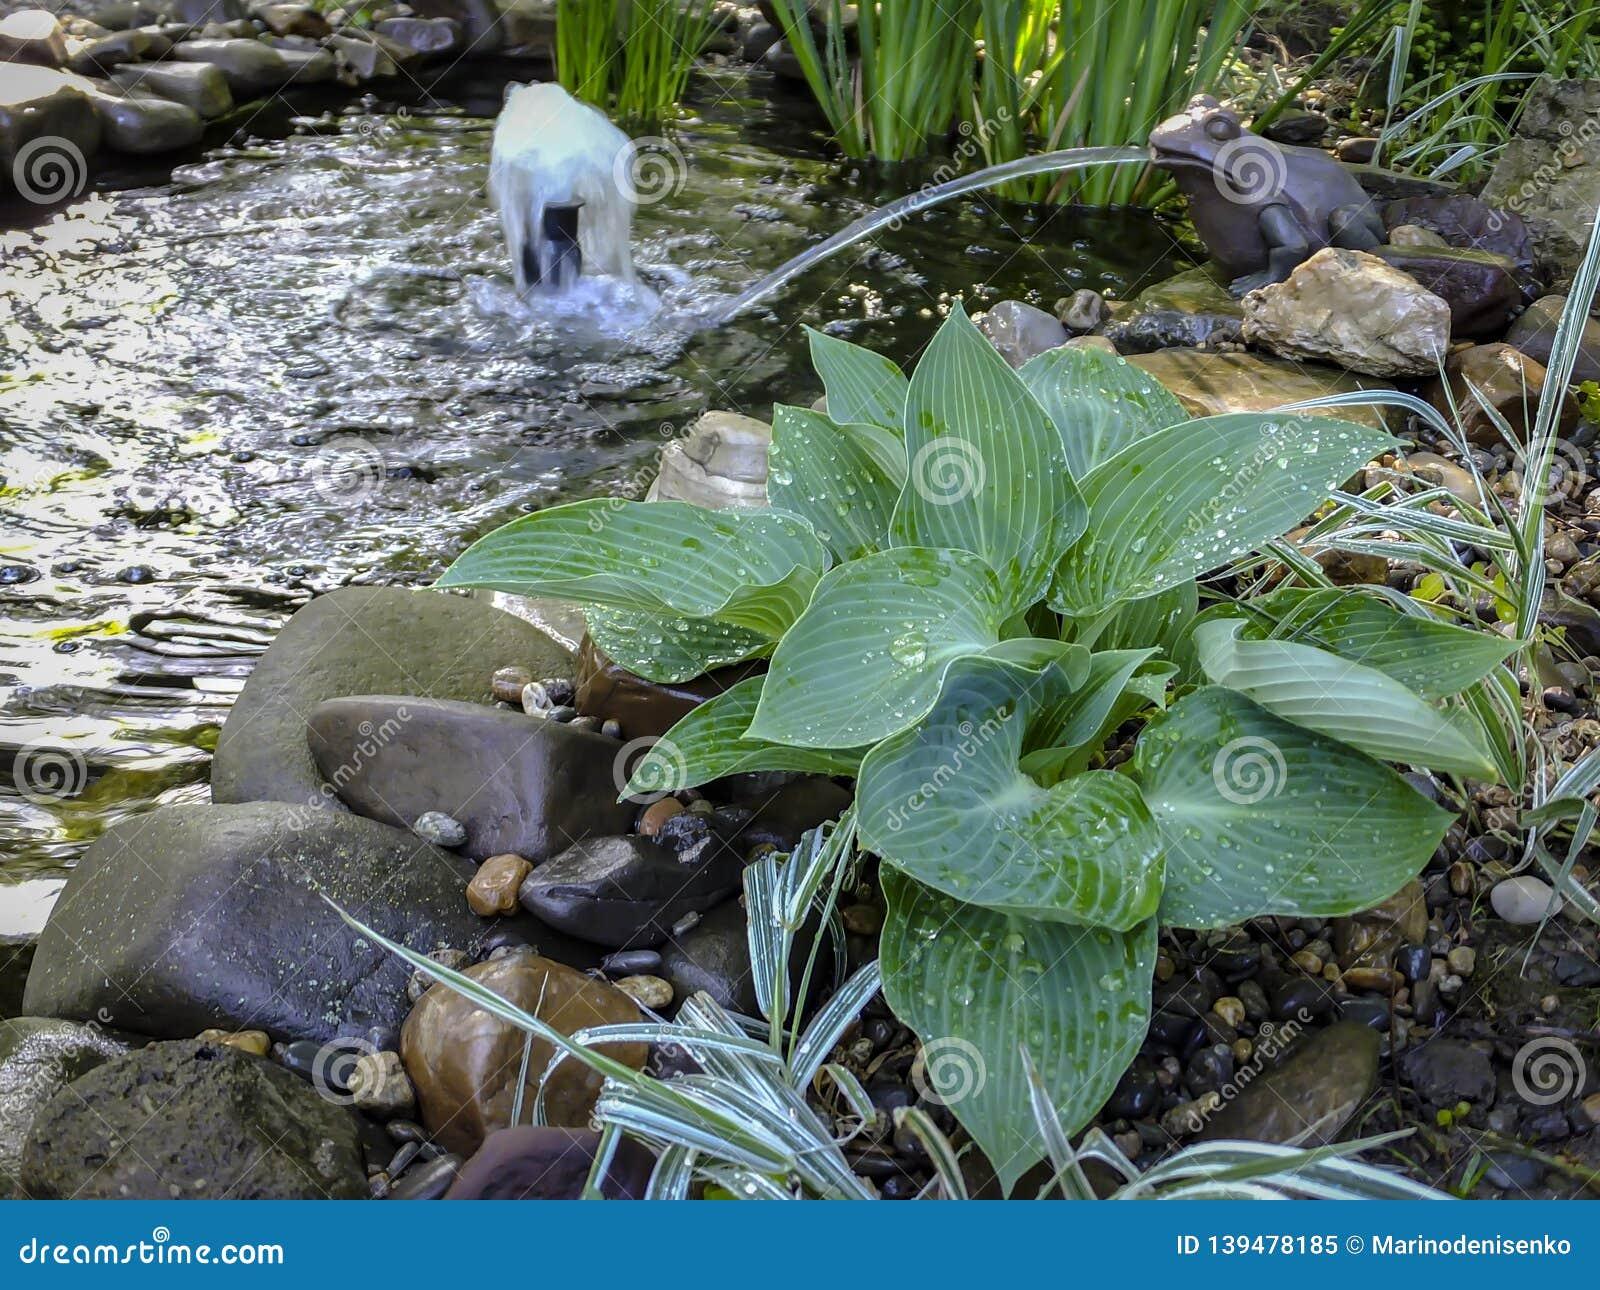 Beautiful Blue Angel Hosta Funkia With A Lush Leaf Grows Near A